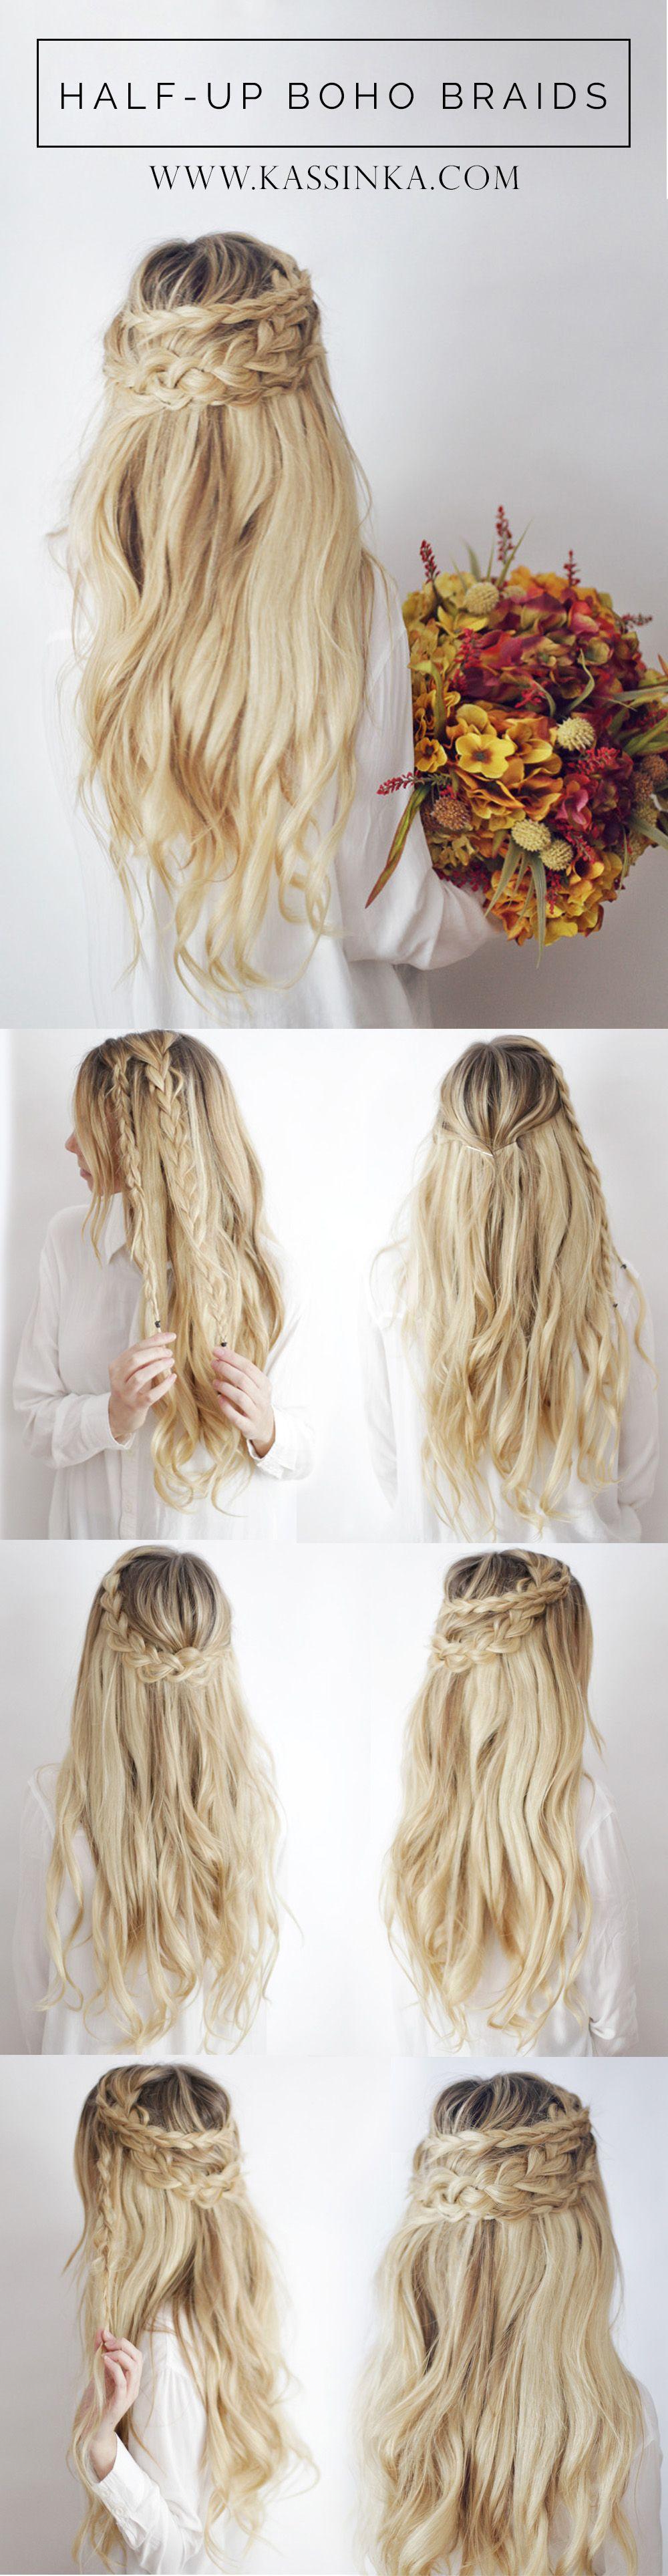 Hair tutorial for halfup boho braids hair pinterest